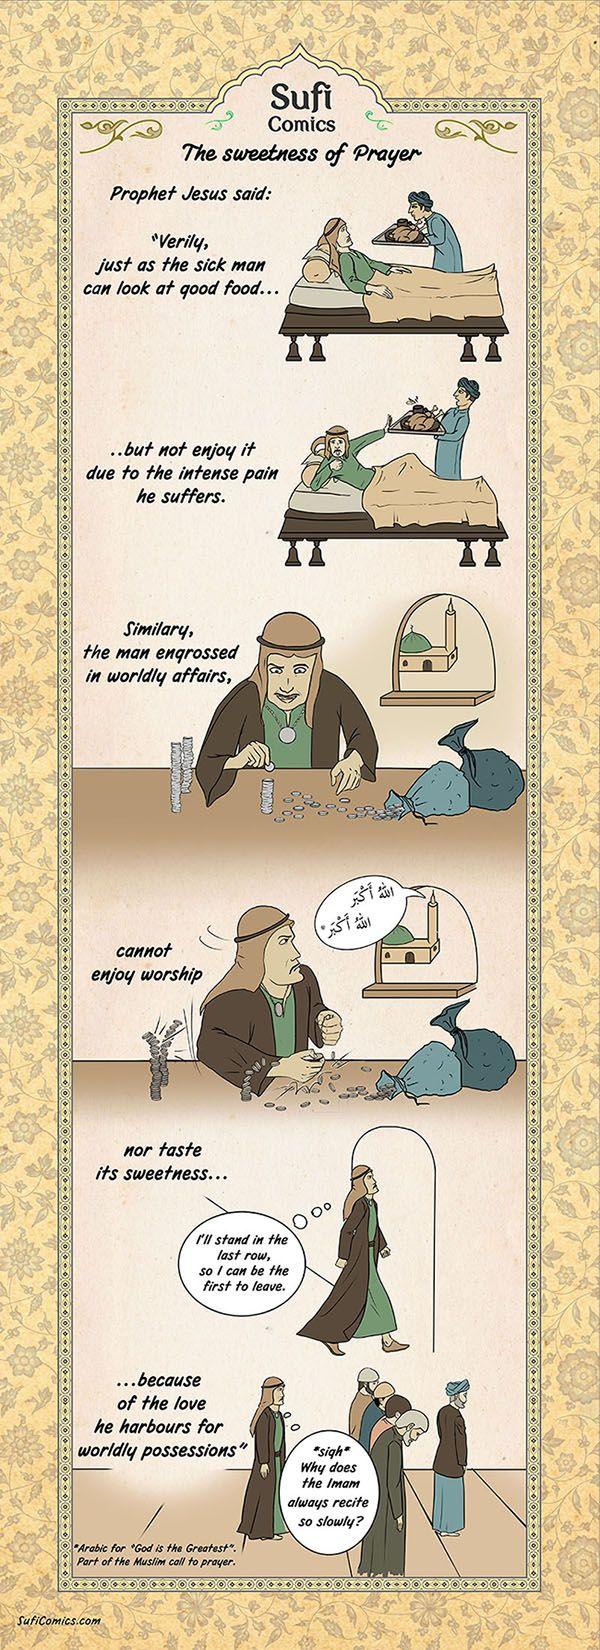 The Sweetness of Prayer - Sufi Comics